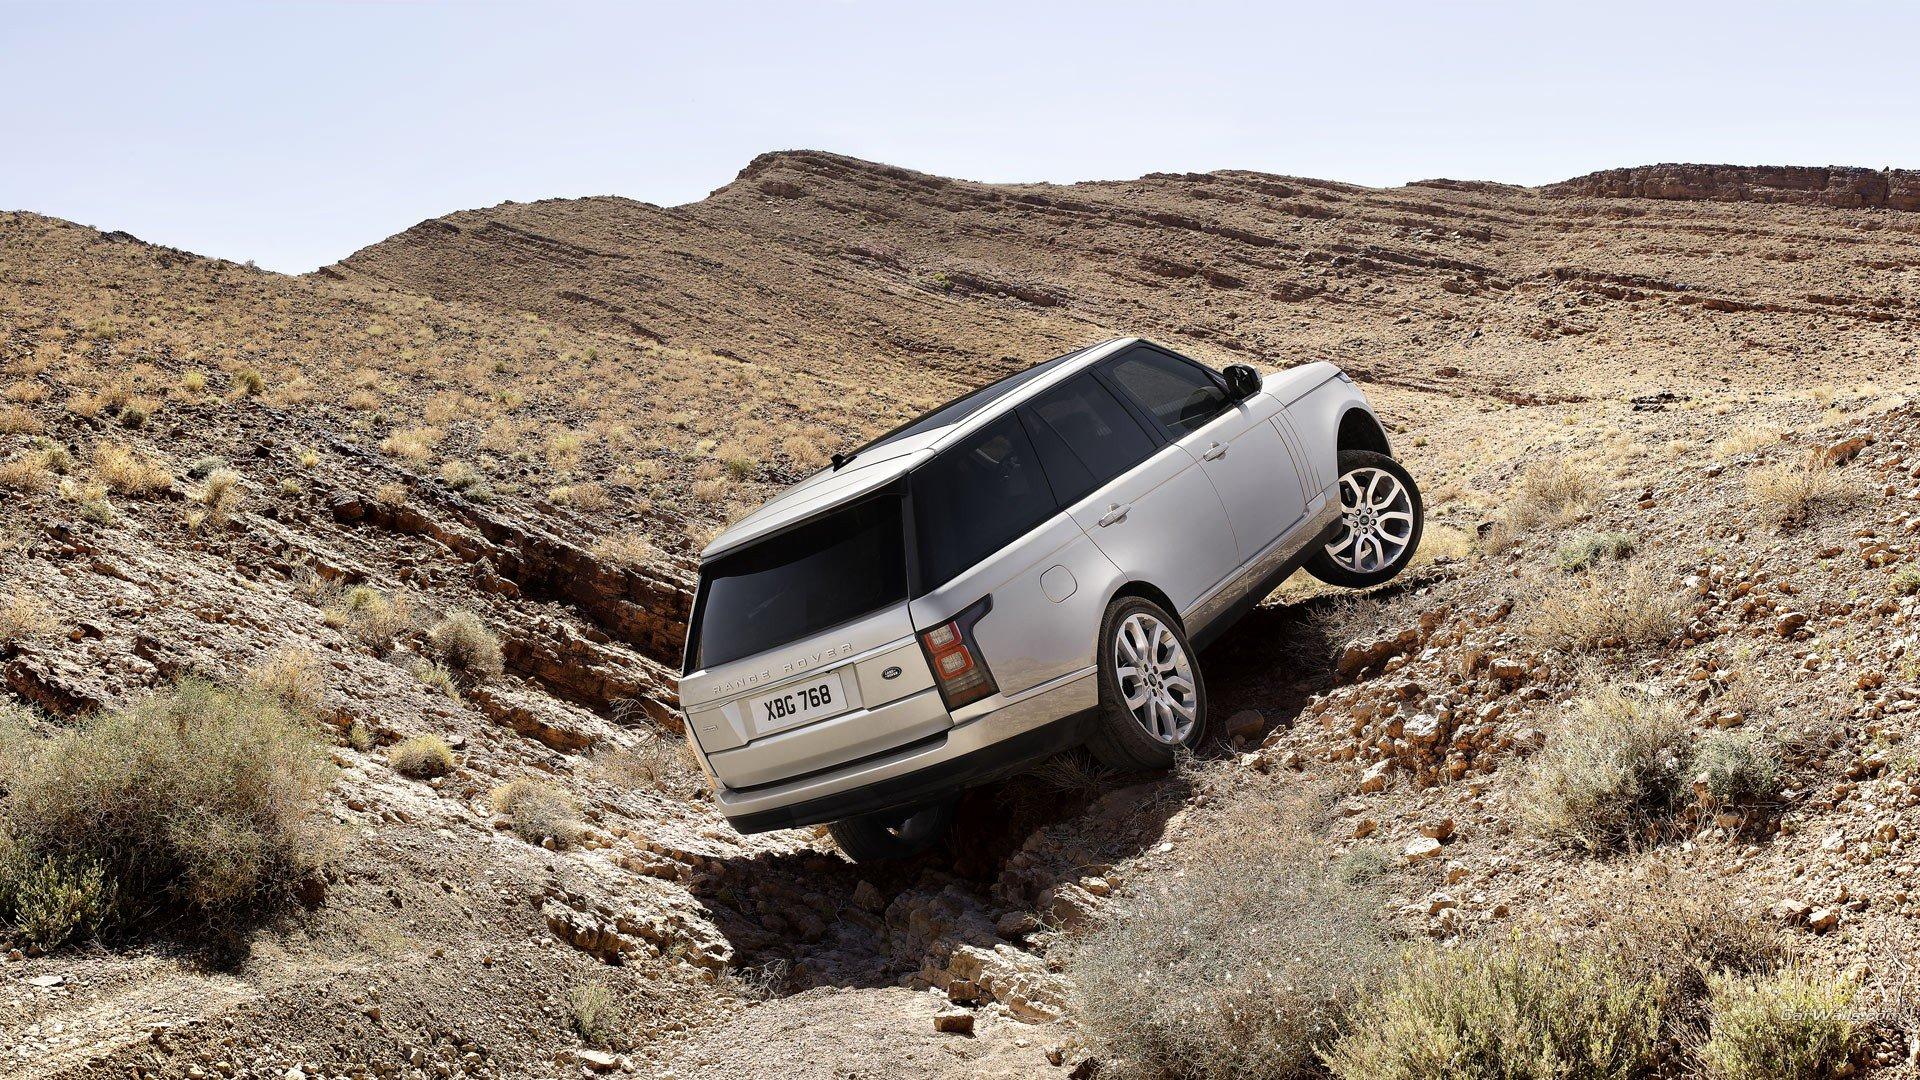 Best Range Rover Wallpaper Id 162884 For High Resolution Full Hd